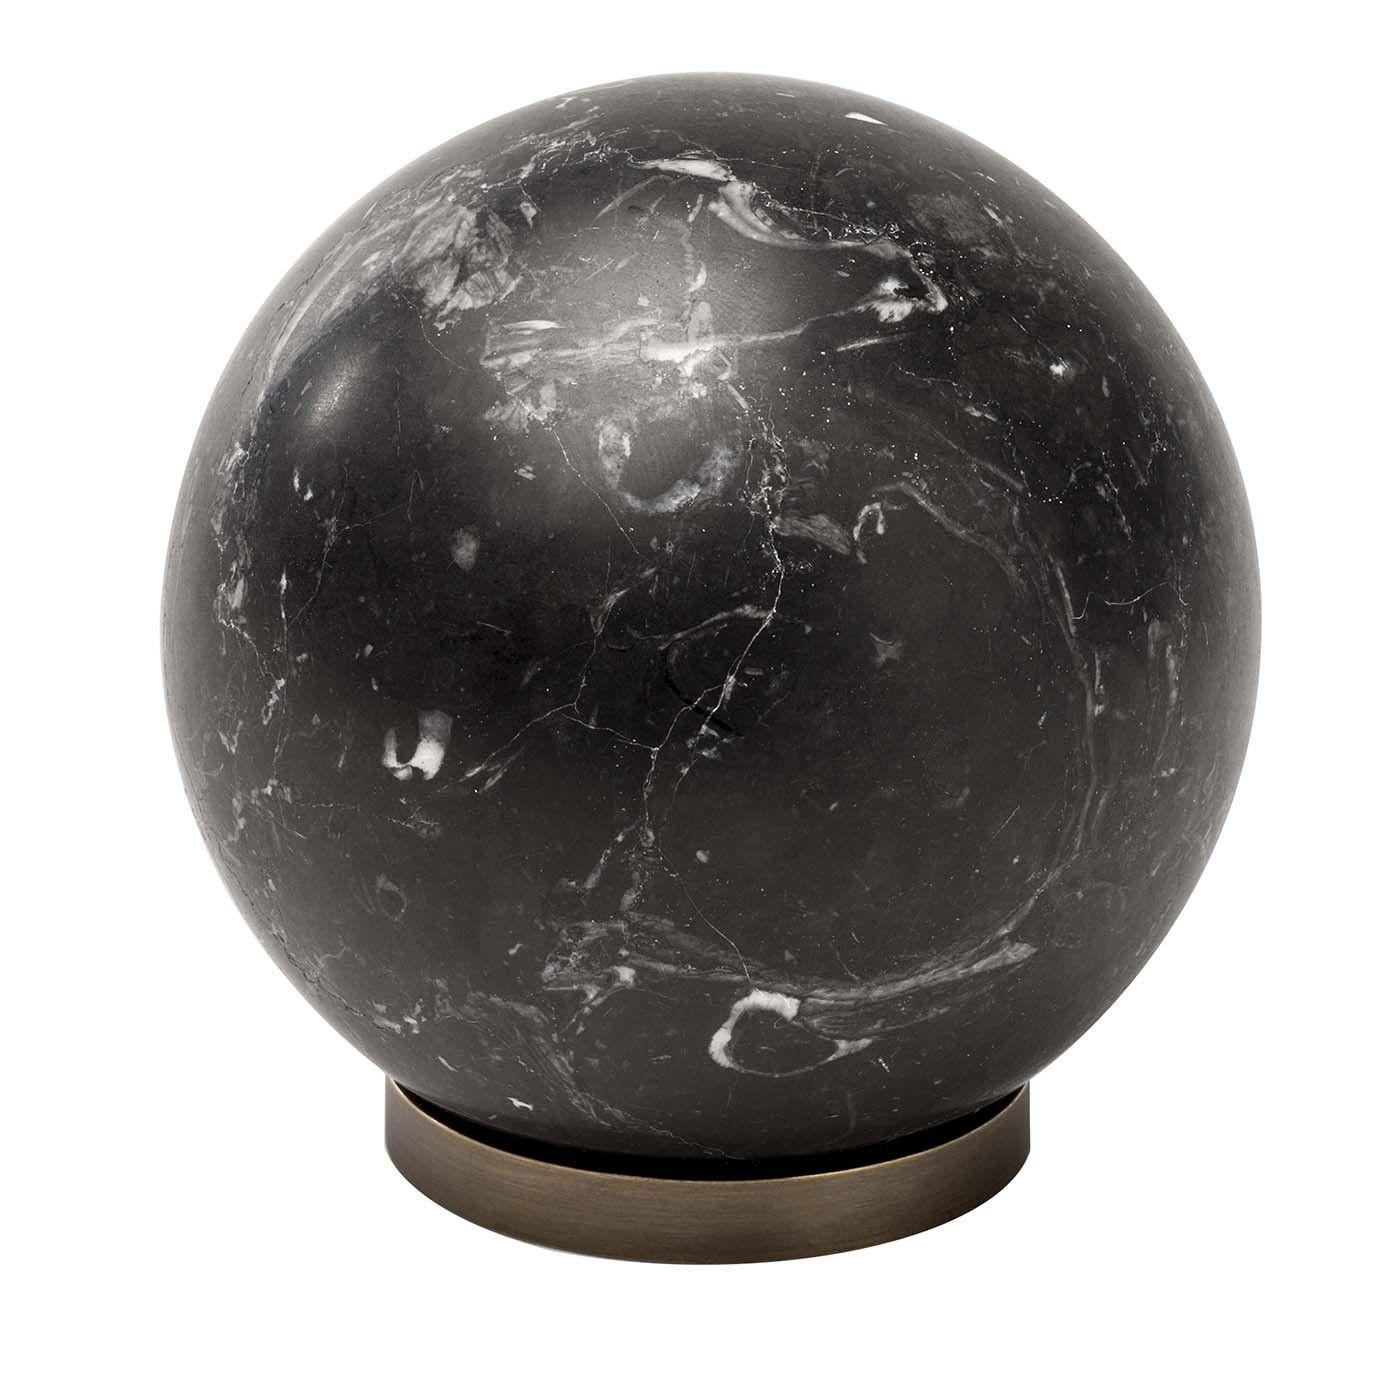 Black Gravity Sculpture In